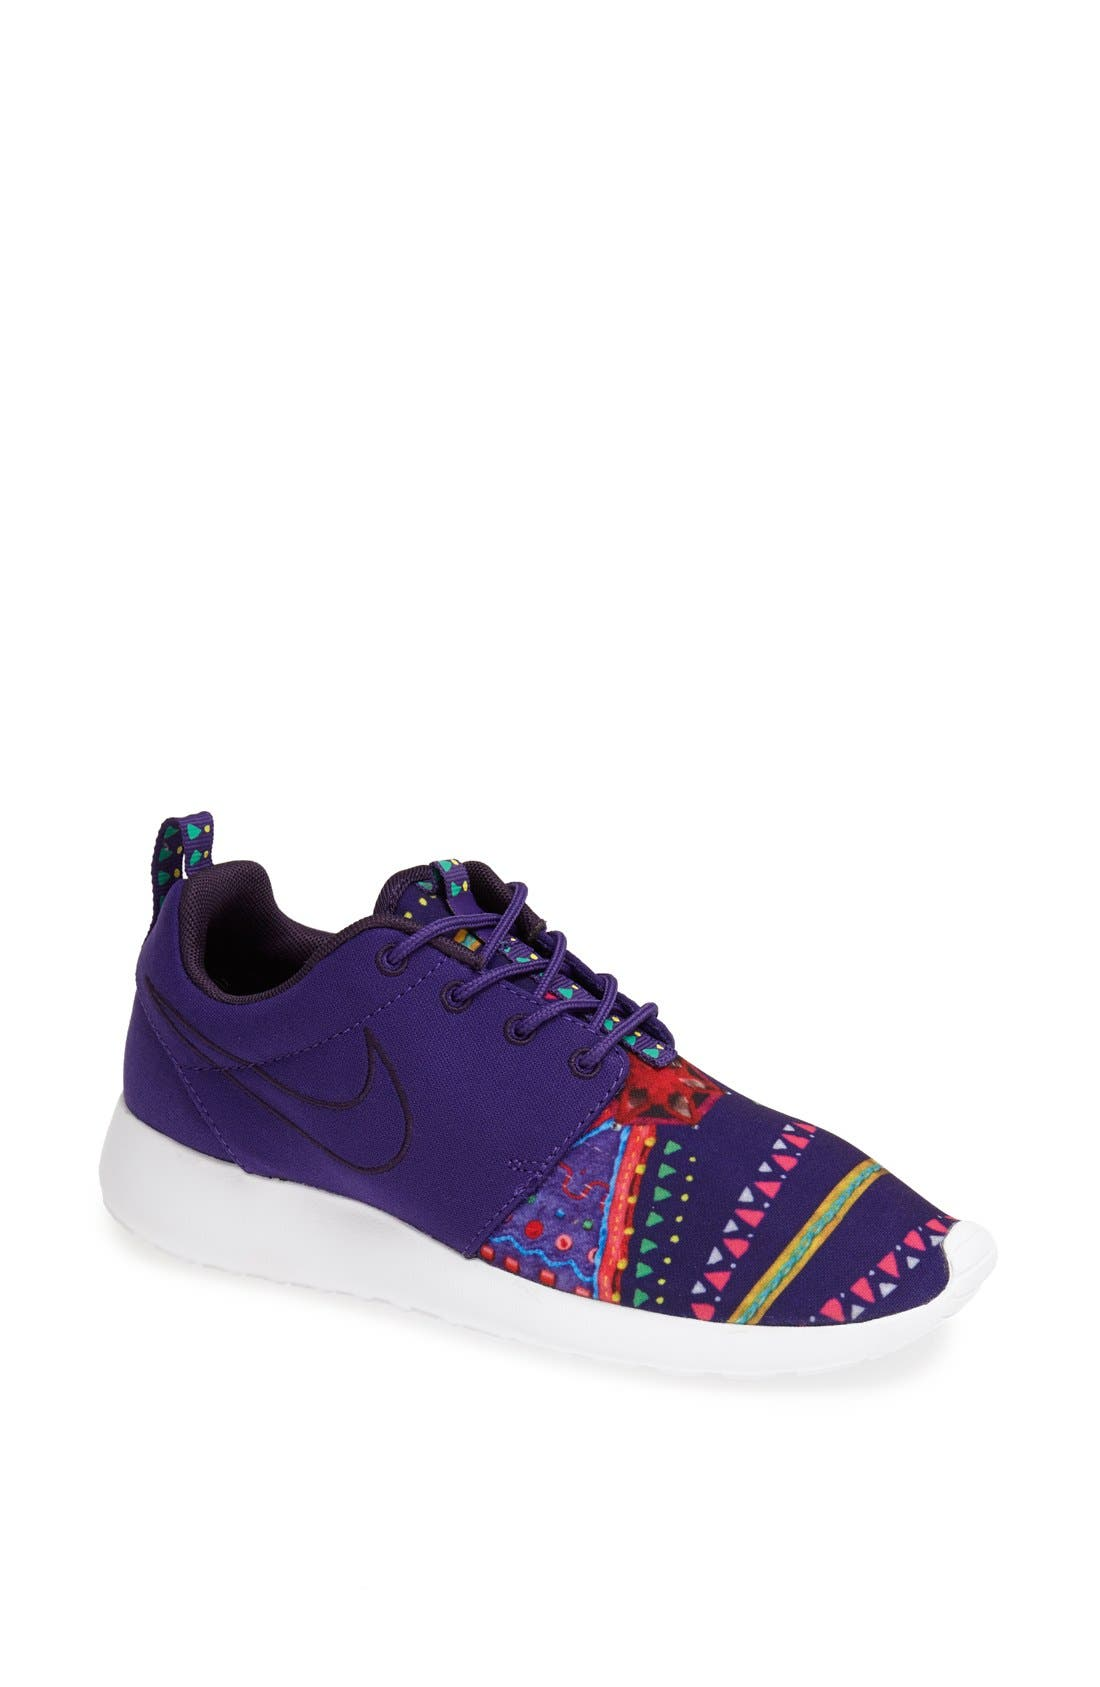 Main Image - Nike 'Roshe Run MP QS' Print Sneaker (Women)